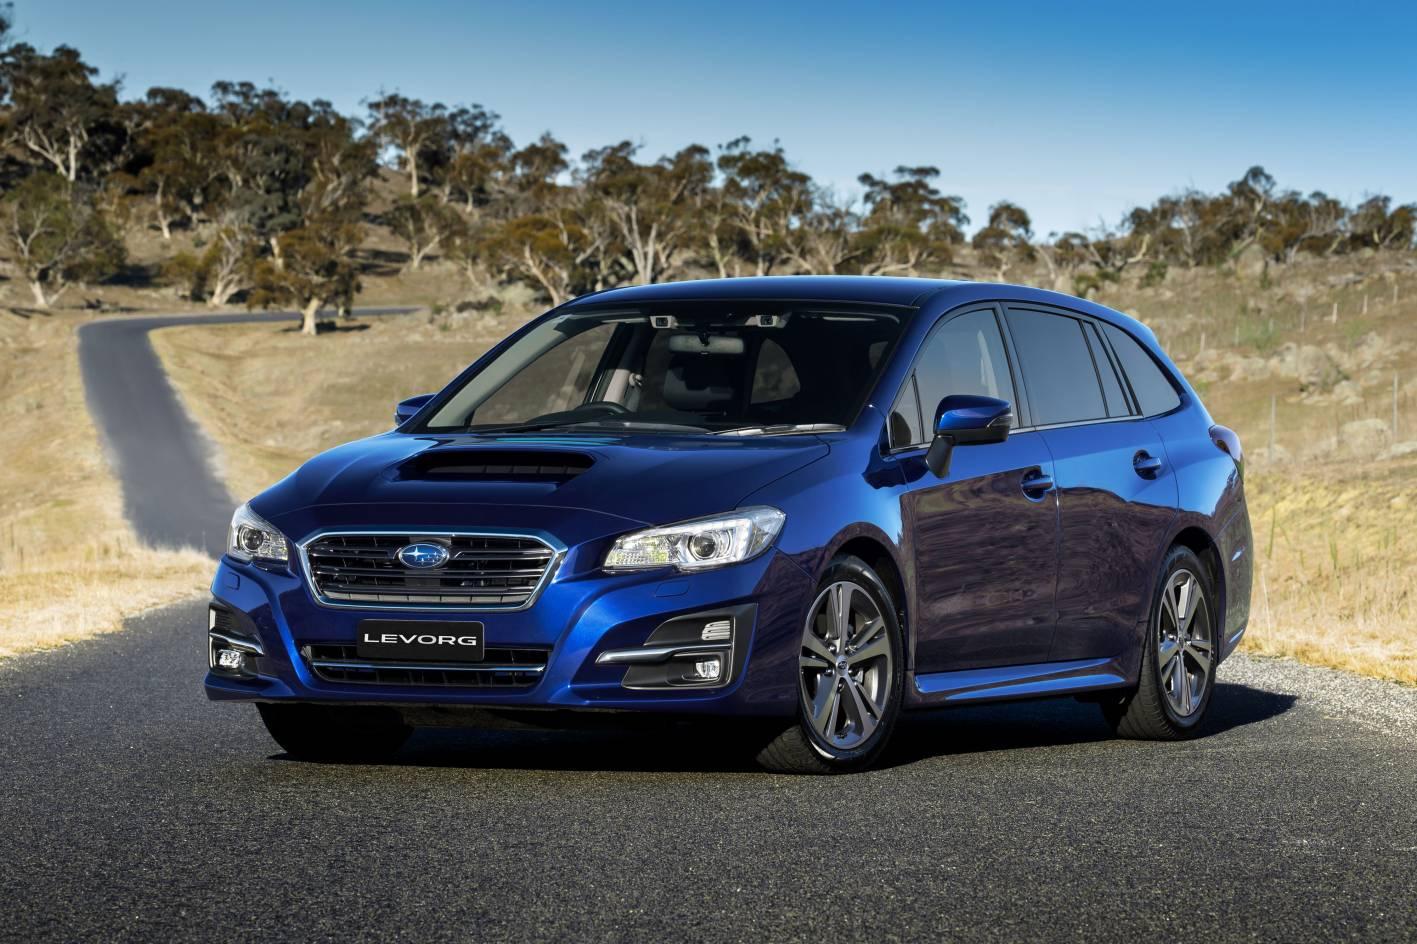 Subaru Levorg 1 6l Turbo Added As New Range Opener